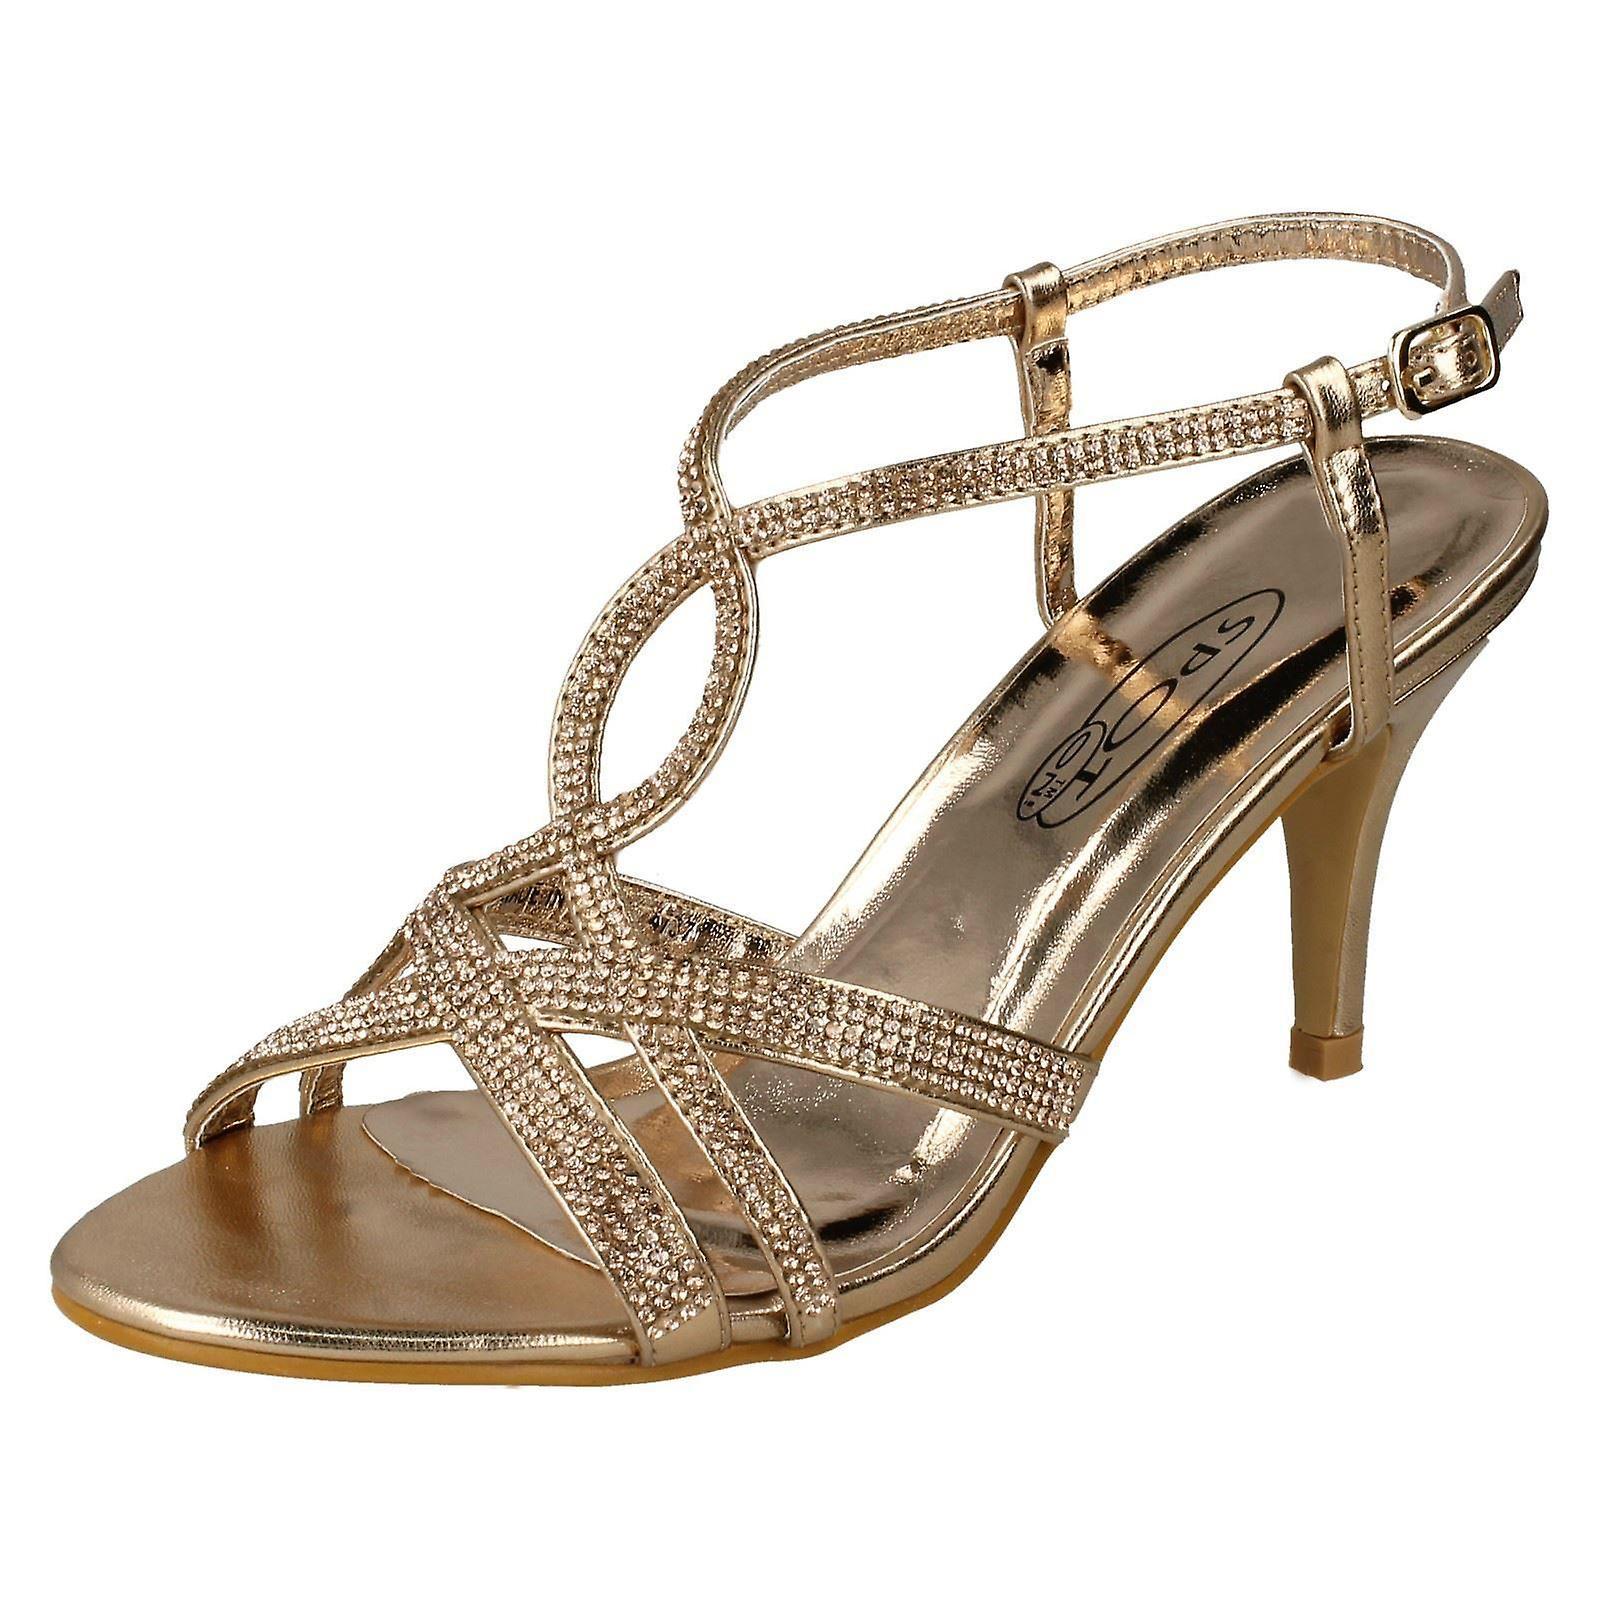 Gold 38 Spot EU On Size Ladies Synthetic F10838 Size 5 Sandals UK Size US 7 Diamante Rose YTCnwwqpO